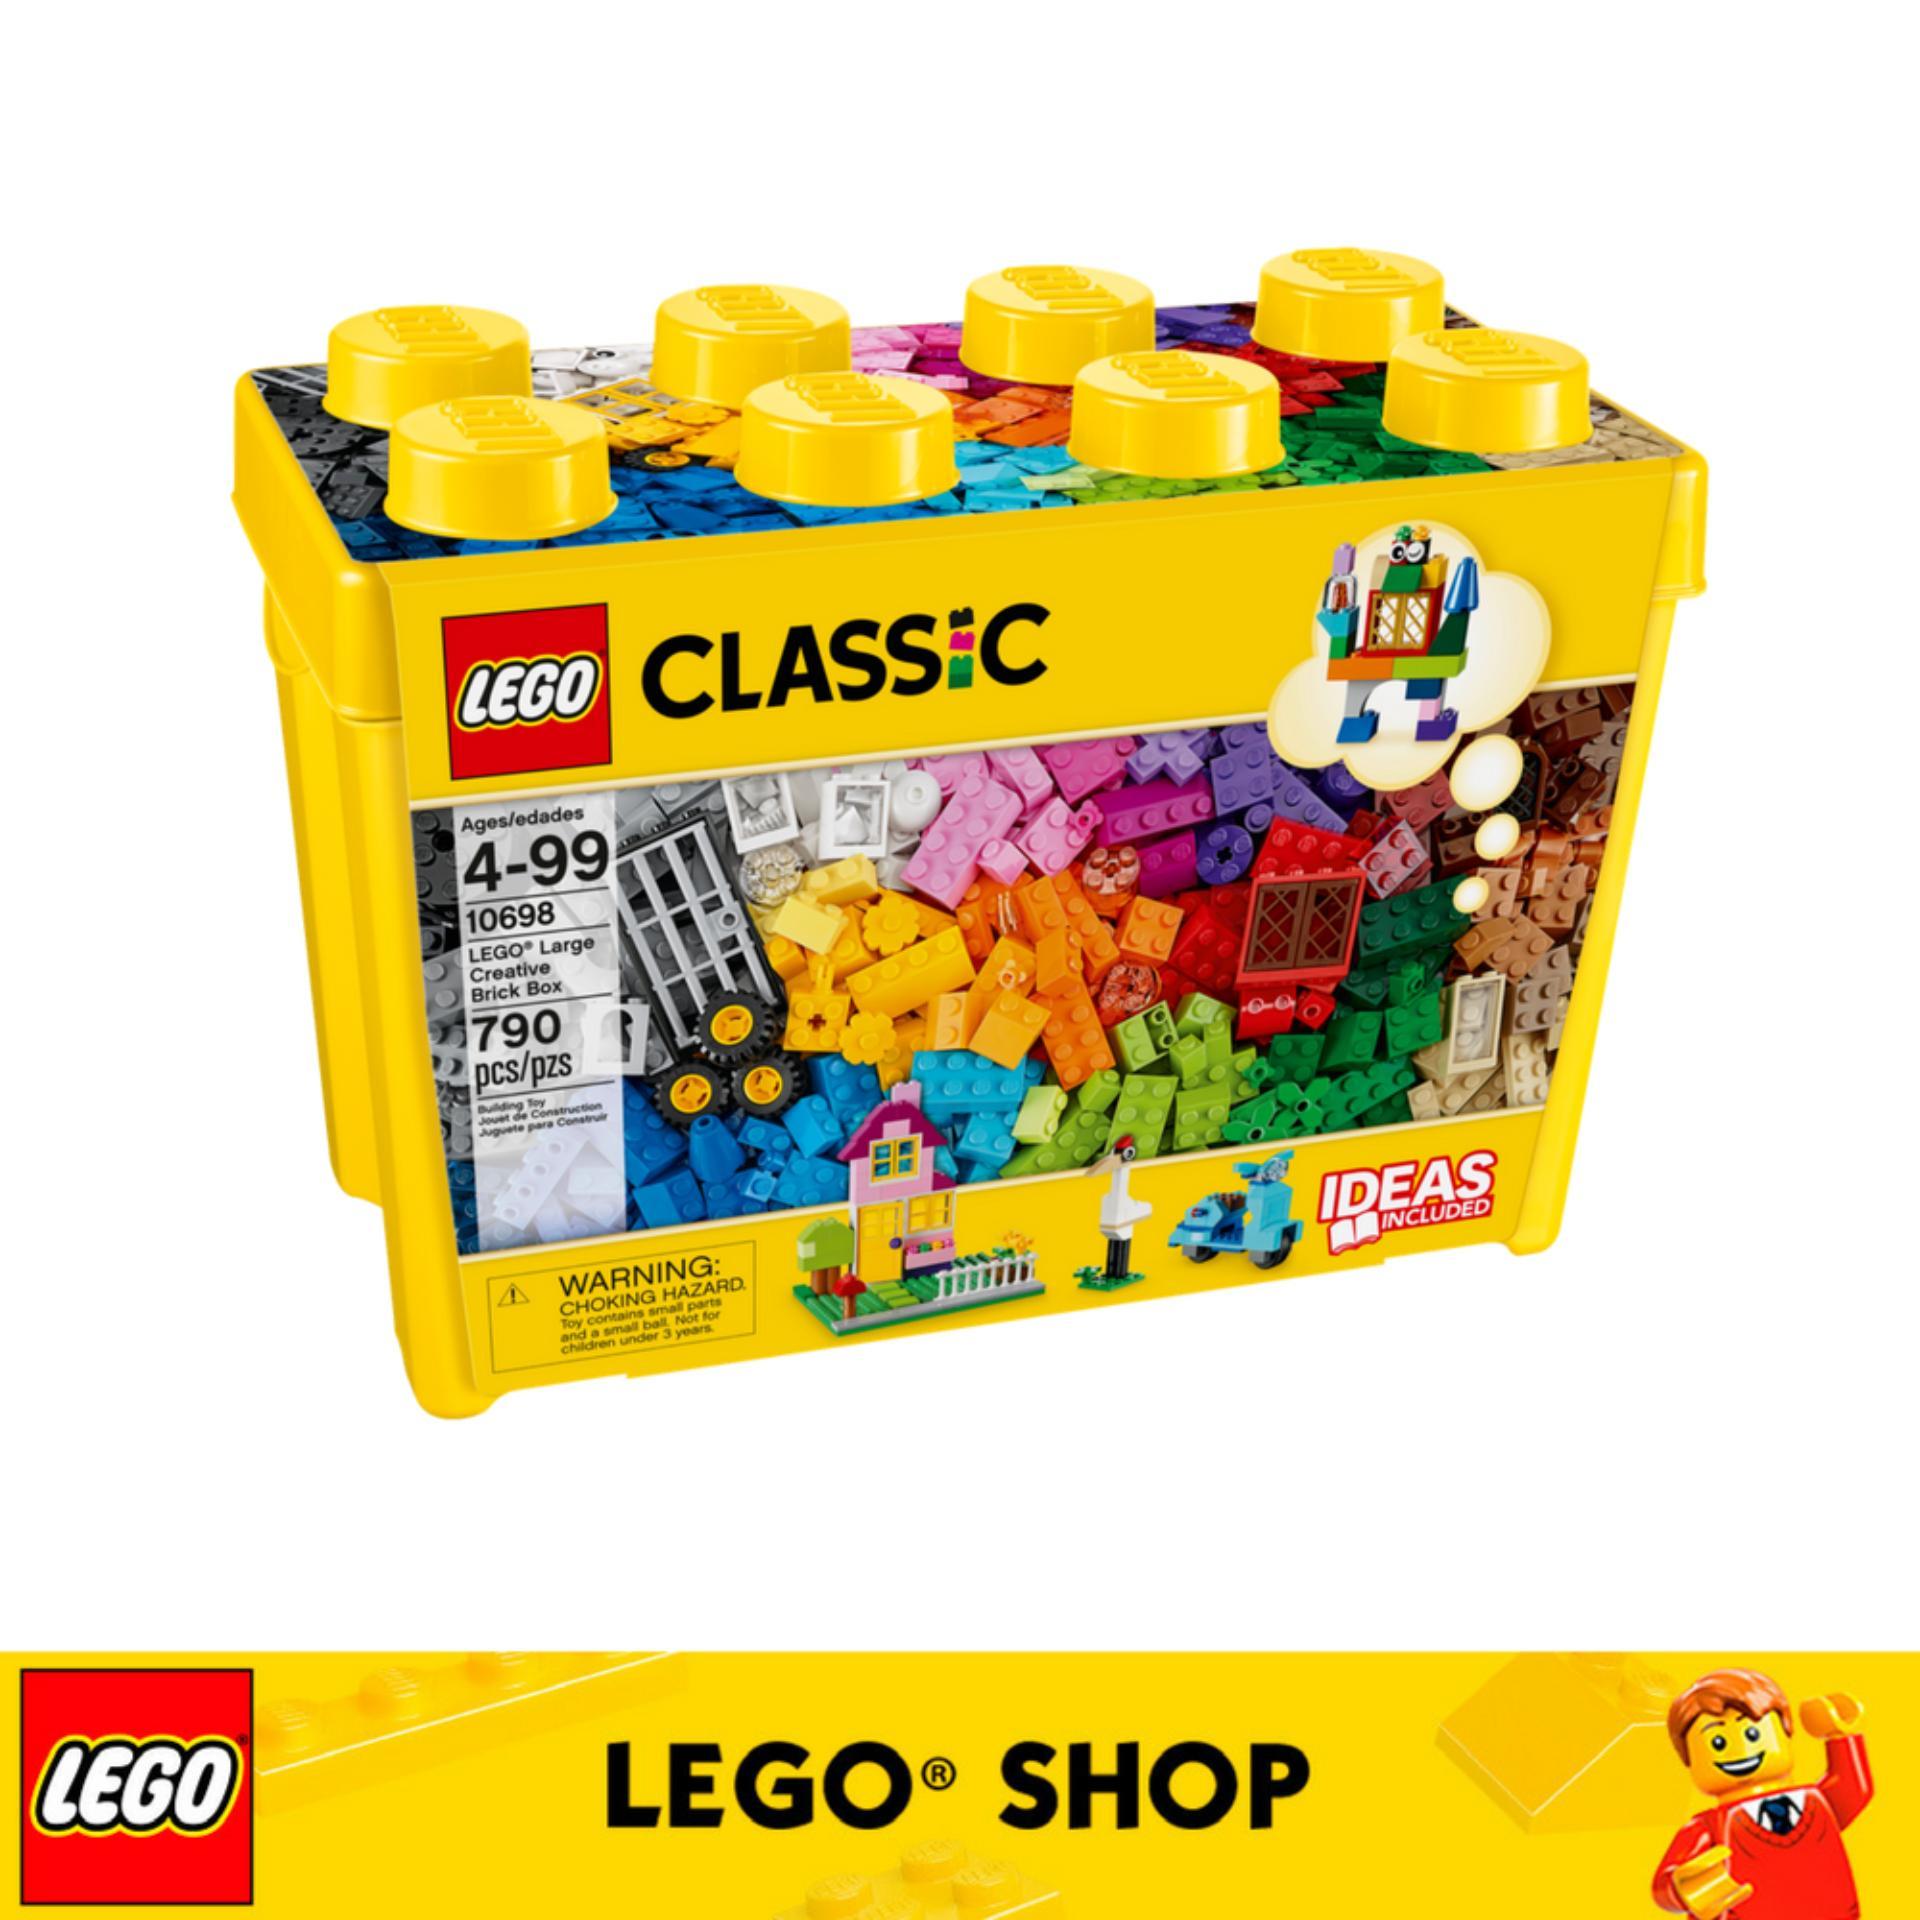 Compare Lego® Lego Classic Lego® Large Creative Brick Box 10698 Prices